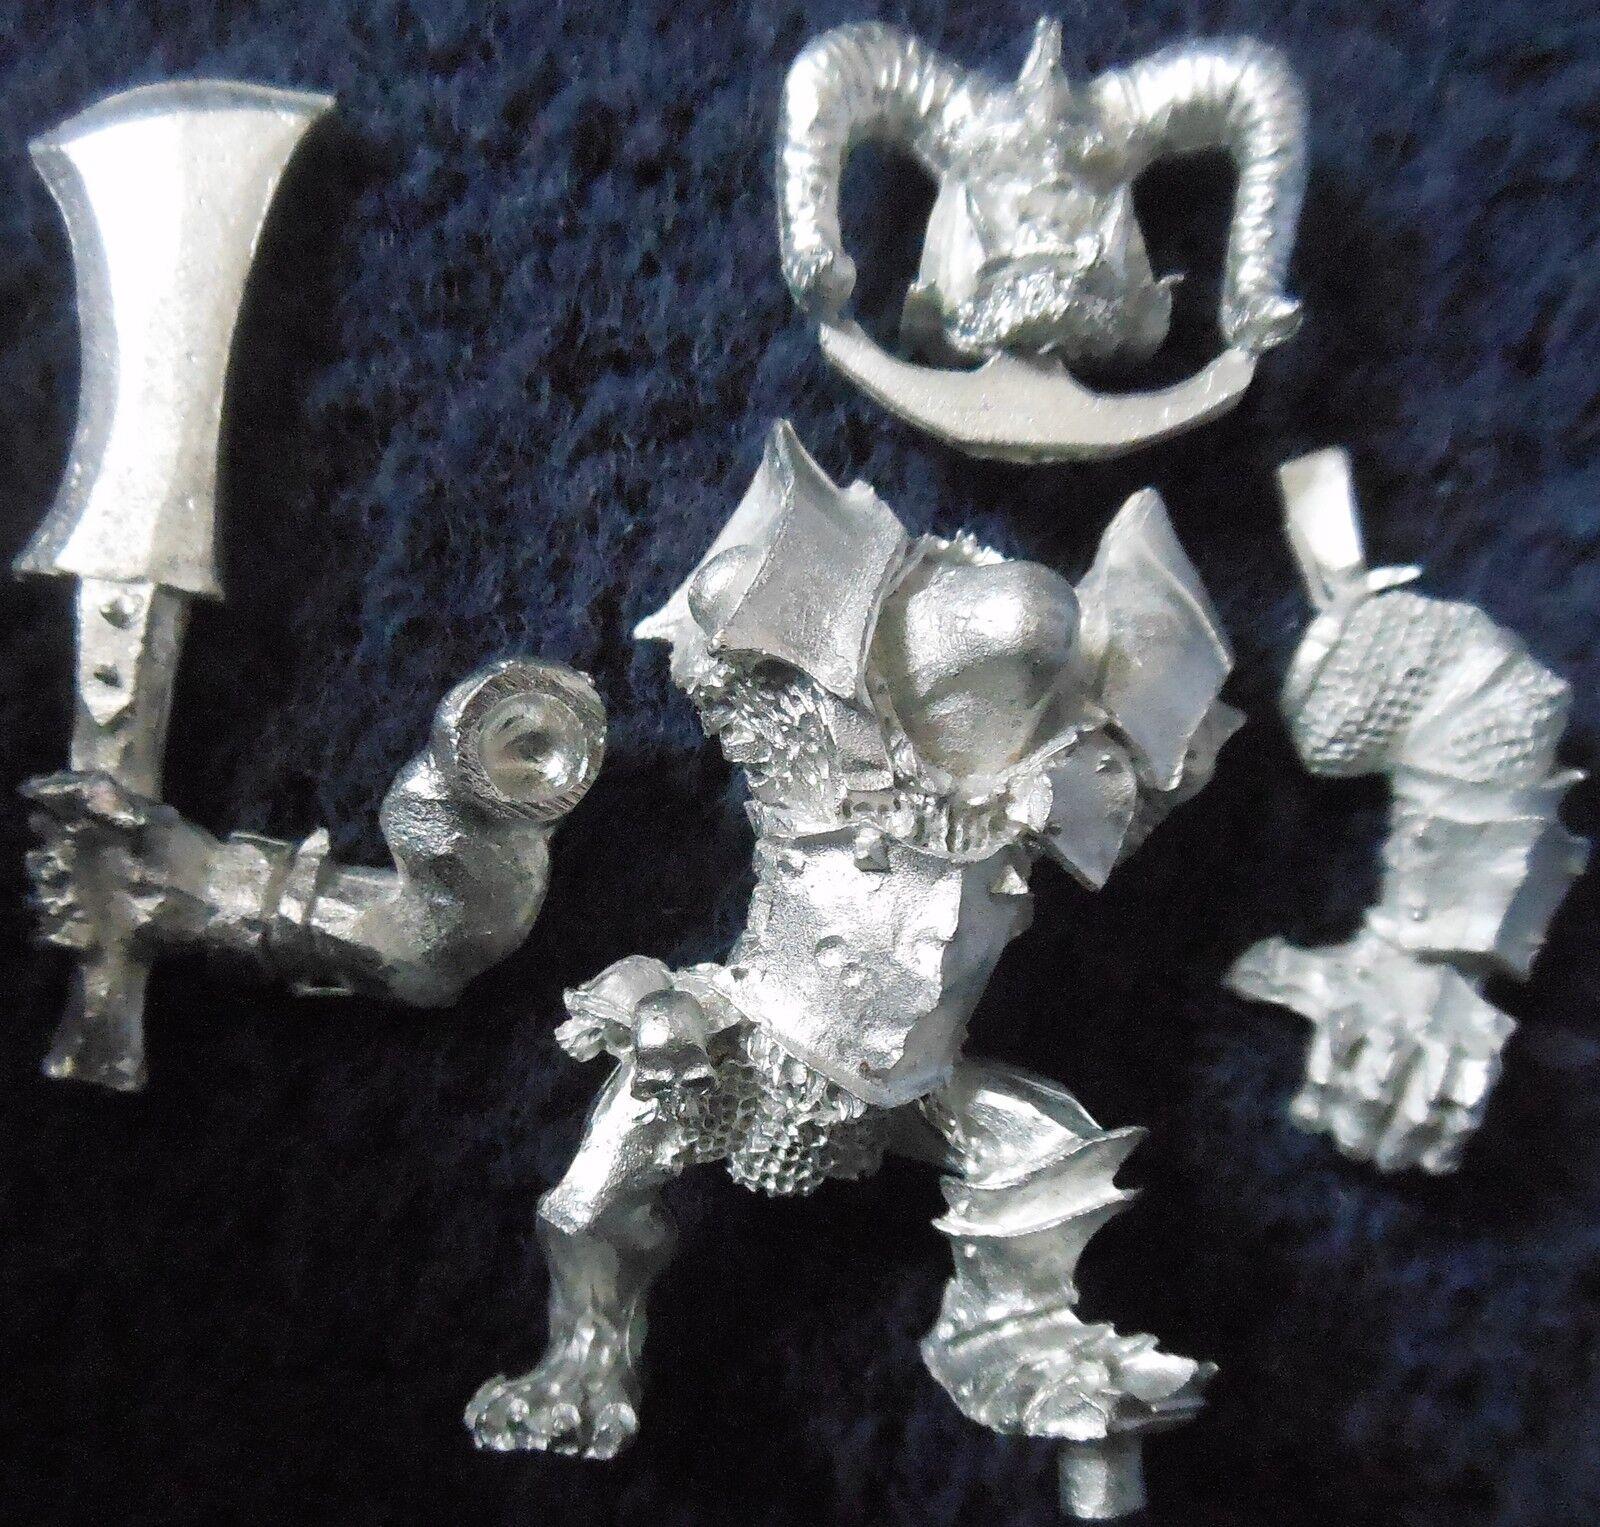 2003 Chaos Ogre 2 Citadel Warhammer Fantasy Battle Army Kingdoms D&D AOS Ogryn